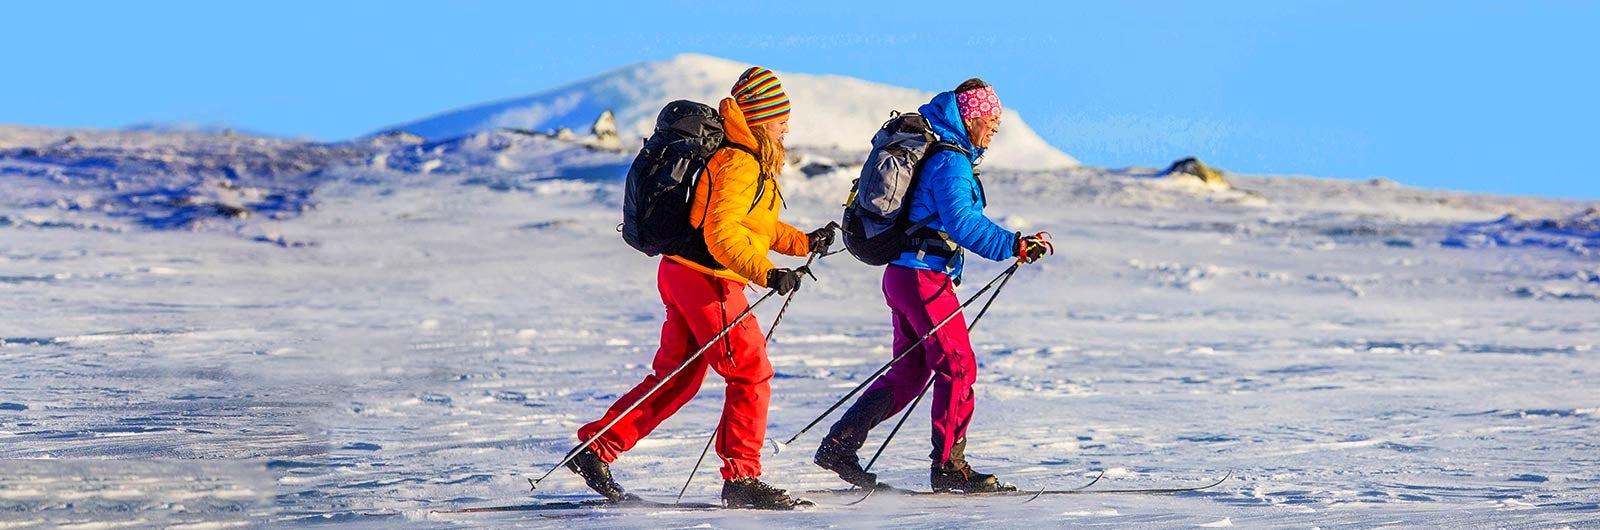 Couple ski touring in the sun